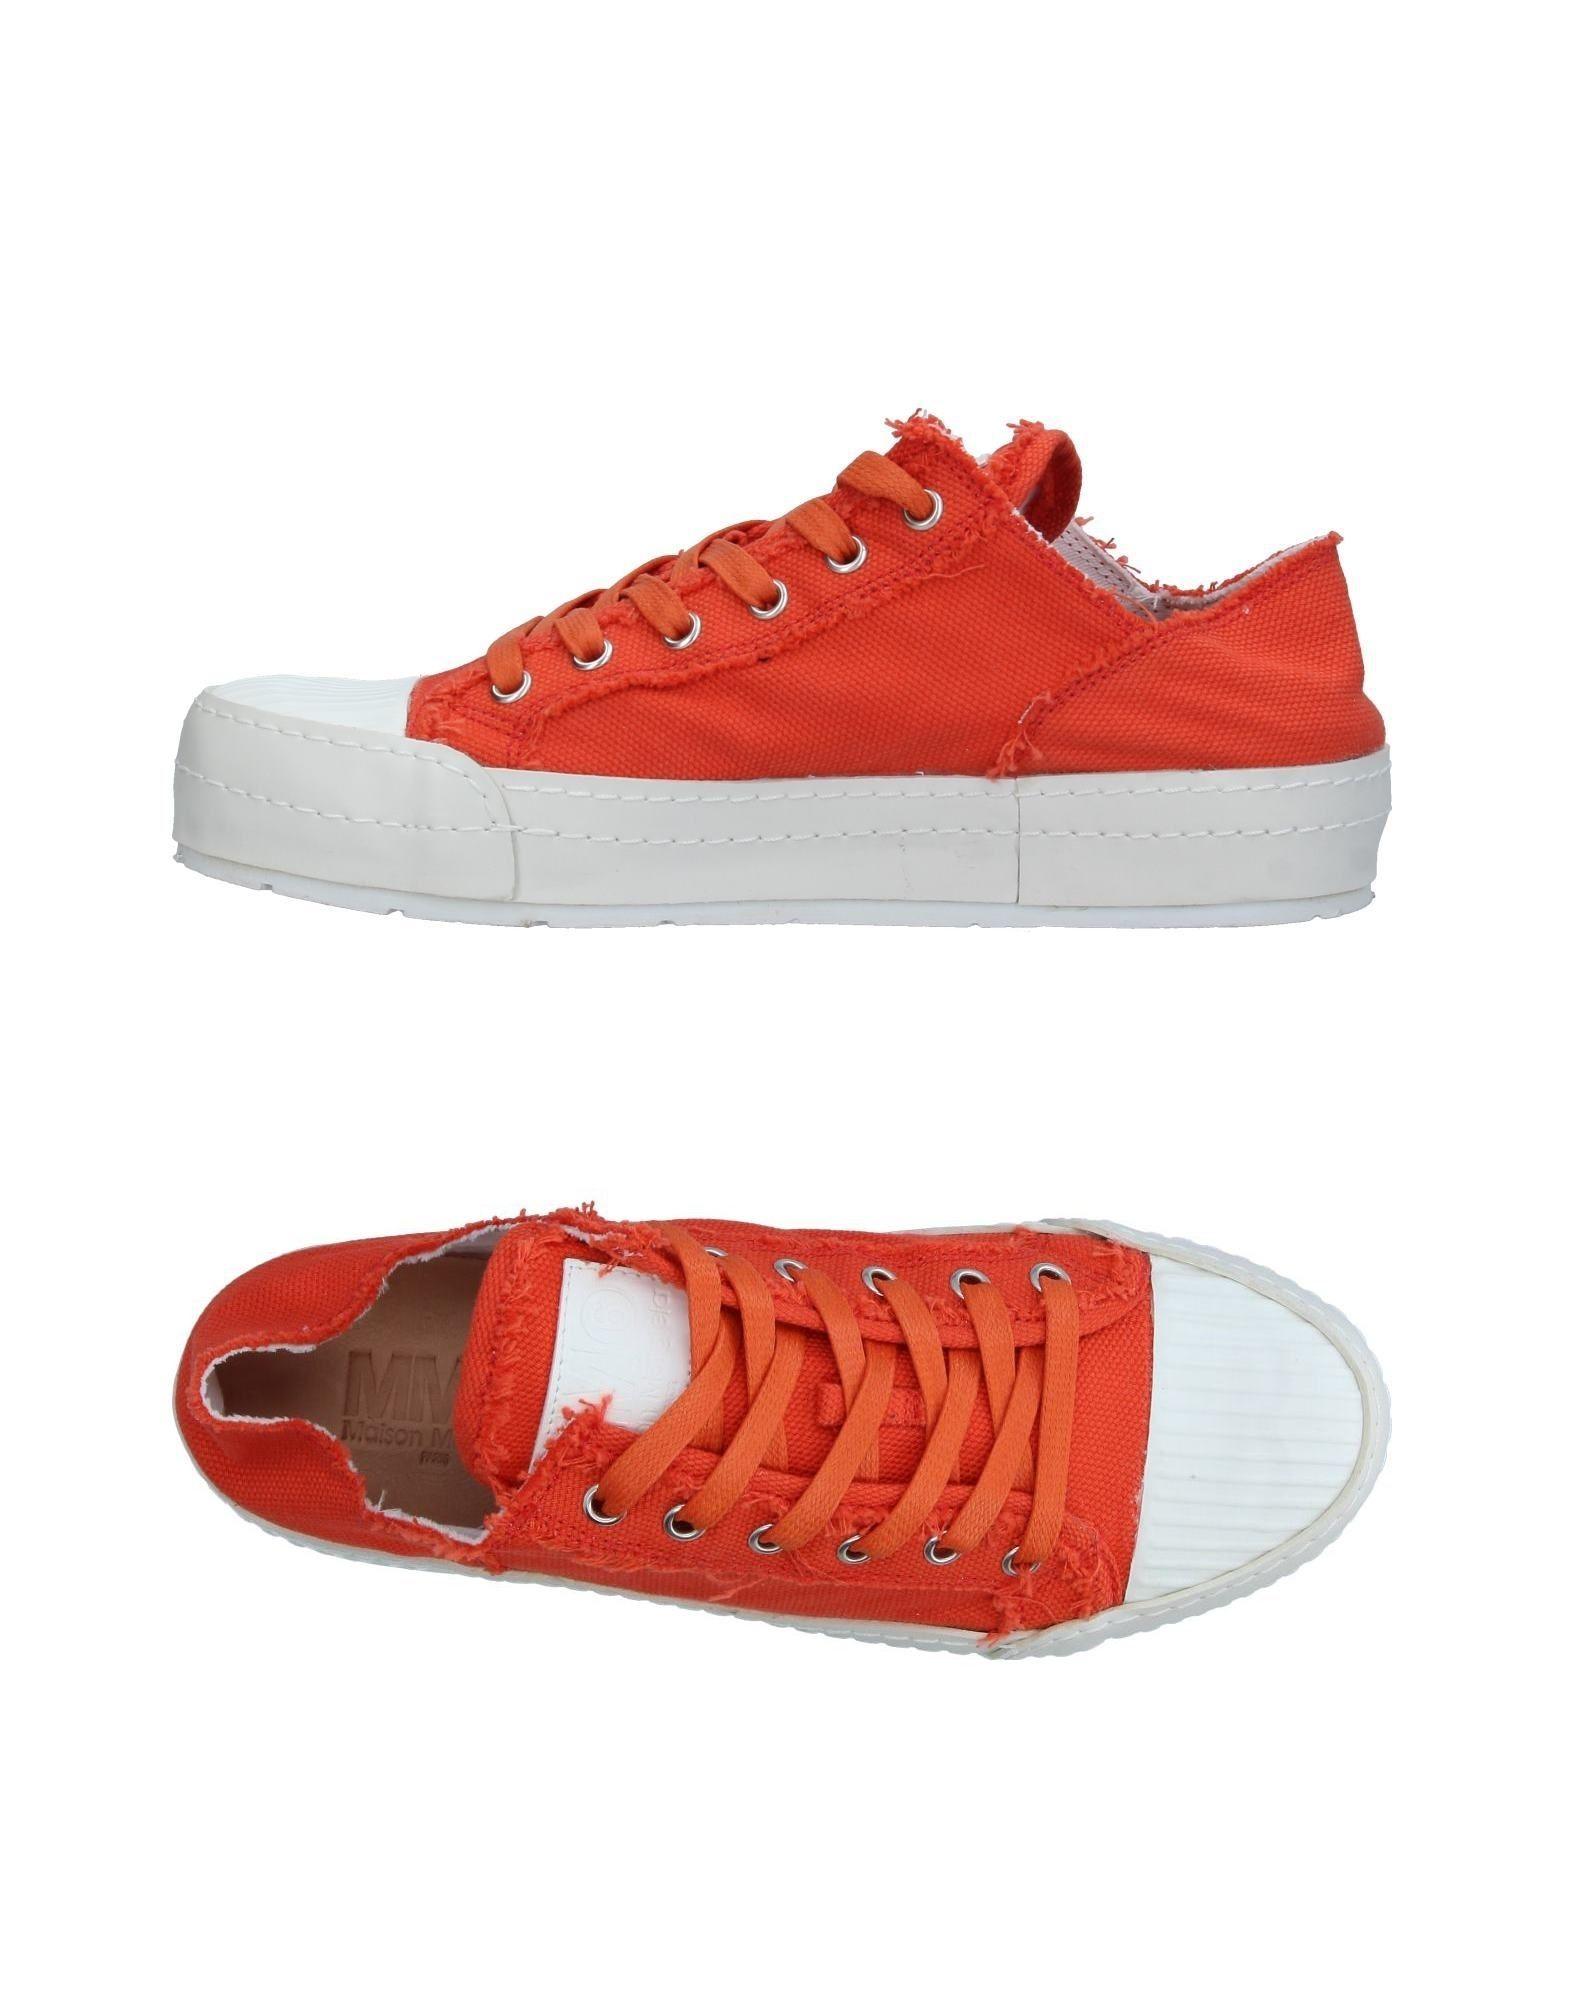 Stilvolle Margiela billige Schuhe Mm6 Maison Margiela Stilvolle Sneakers Damen  11331240TA 99d4e8